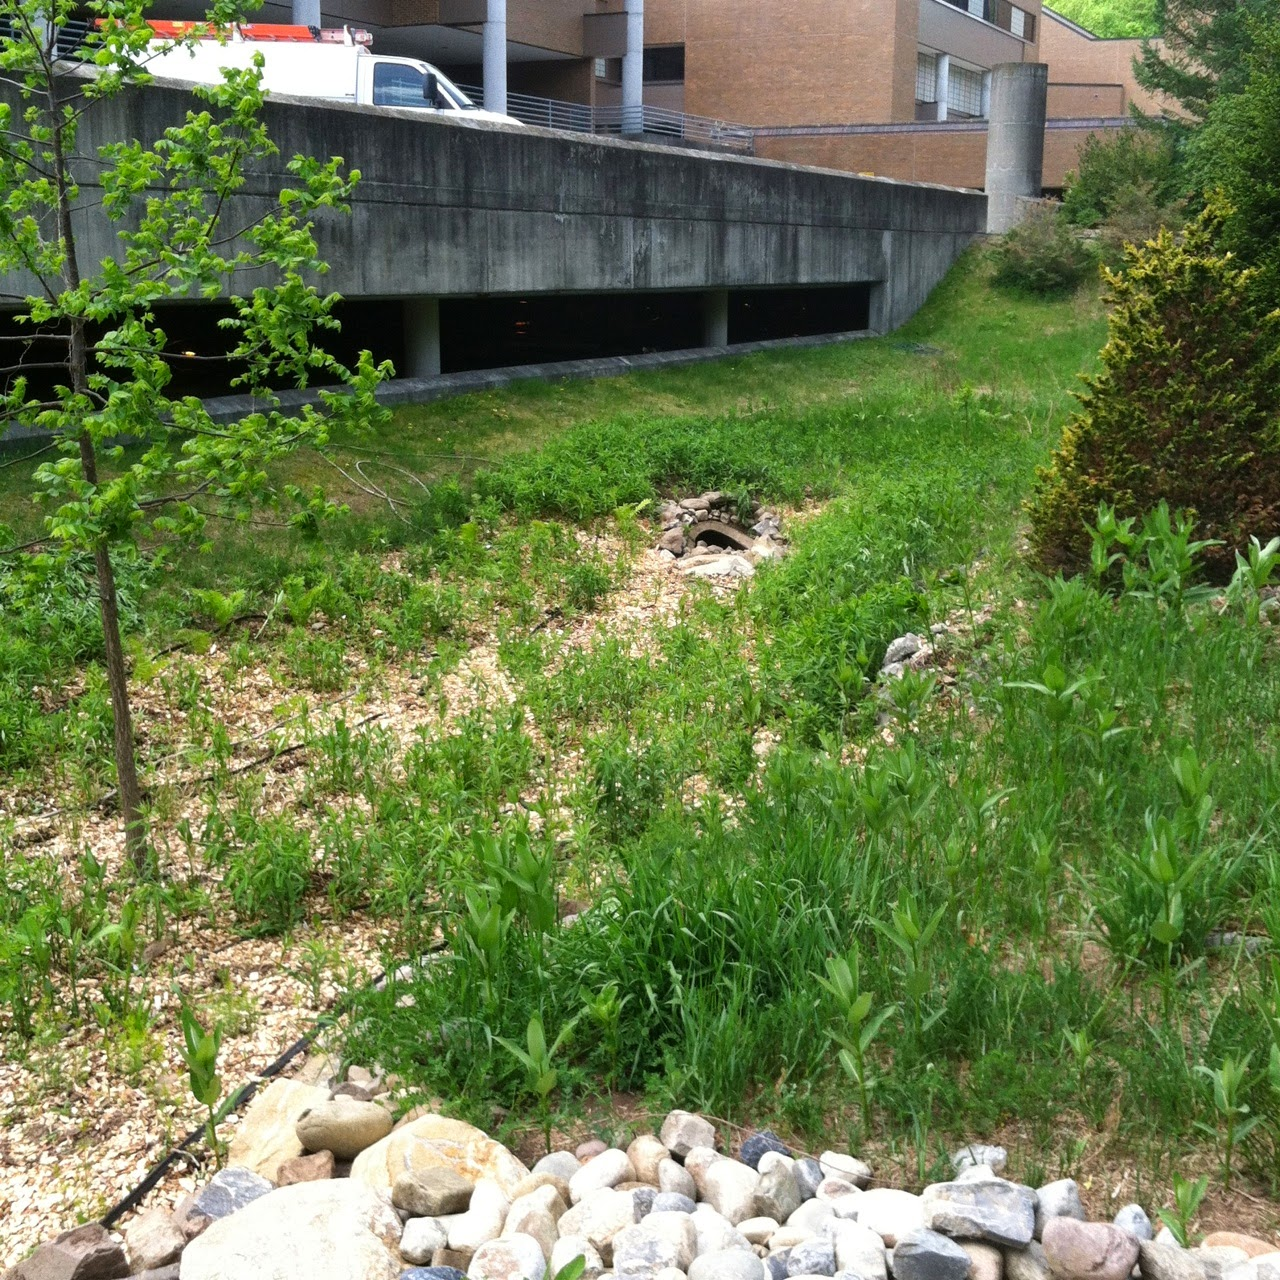 Green Stormwater Infrastructure Grant Project: Rain Garden Progress